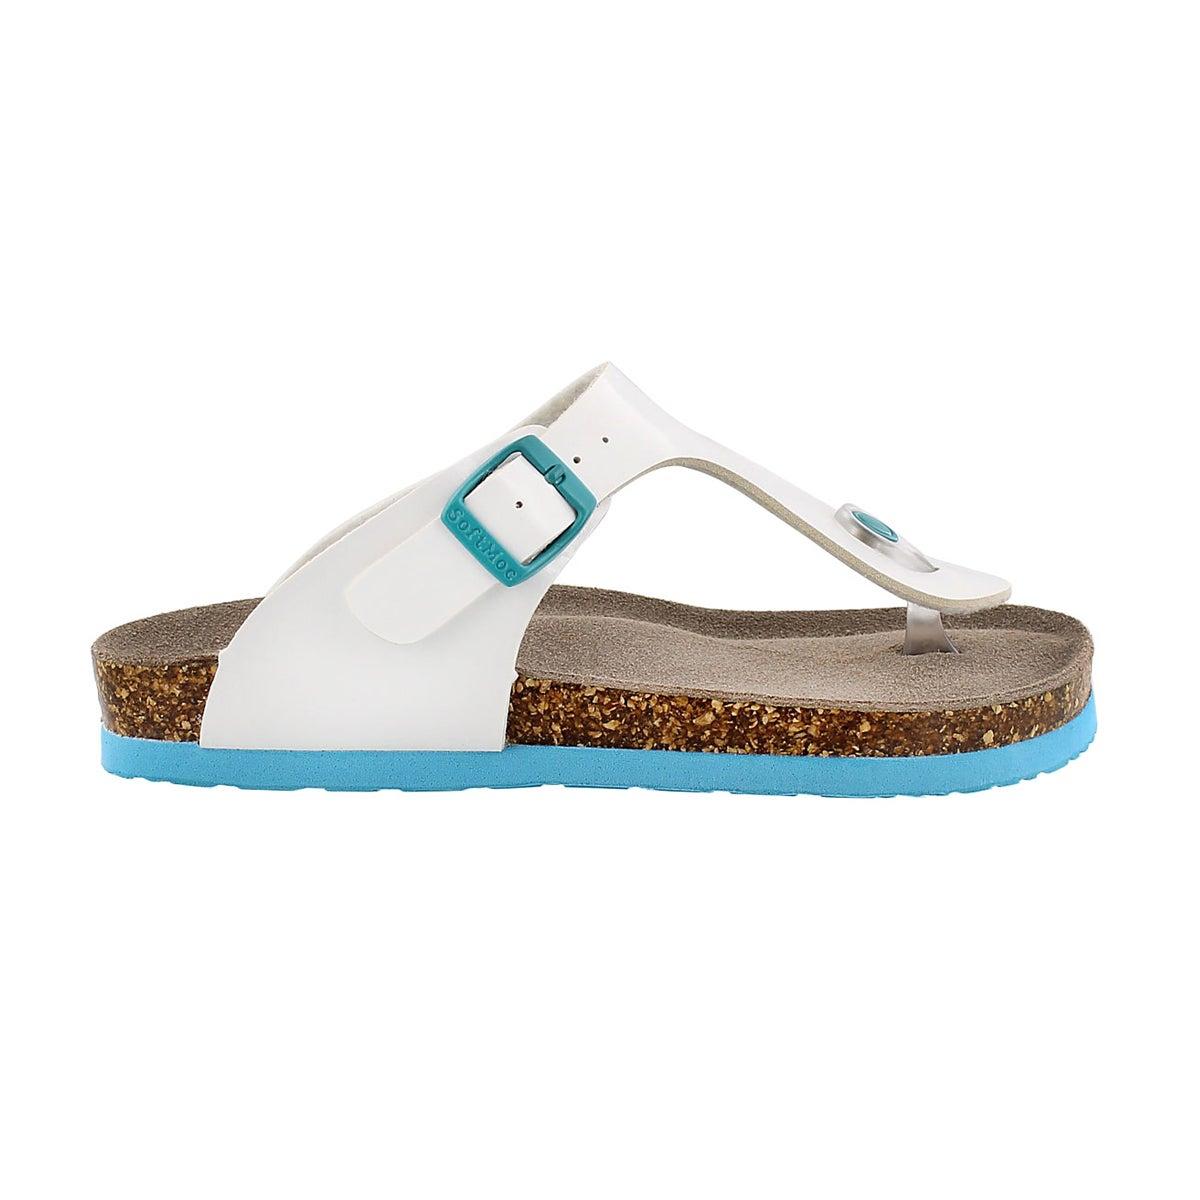 Grls Angy 3 white patent thong sandal